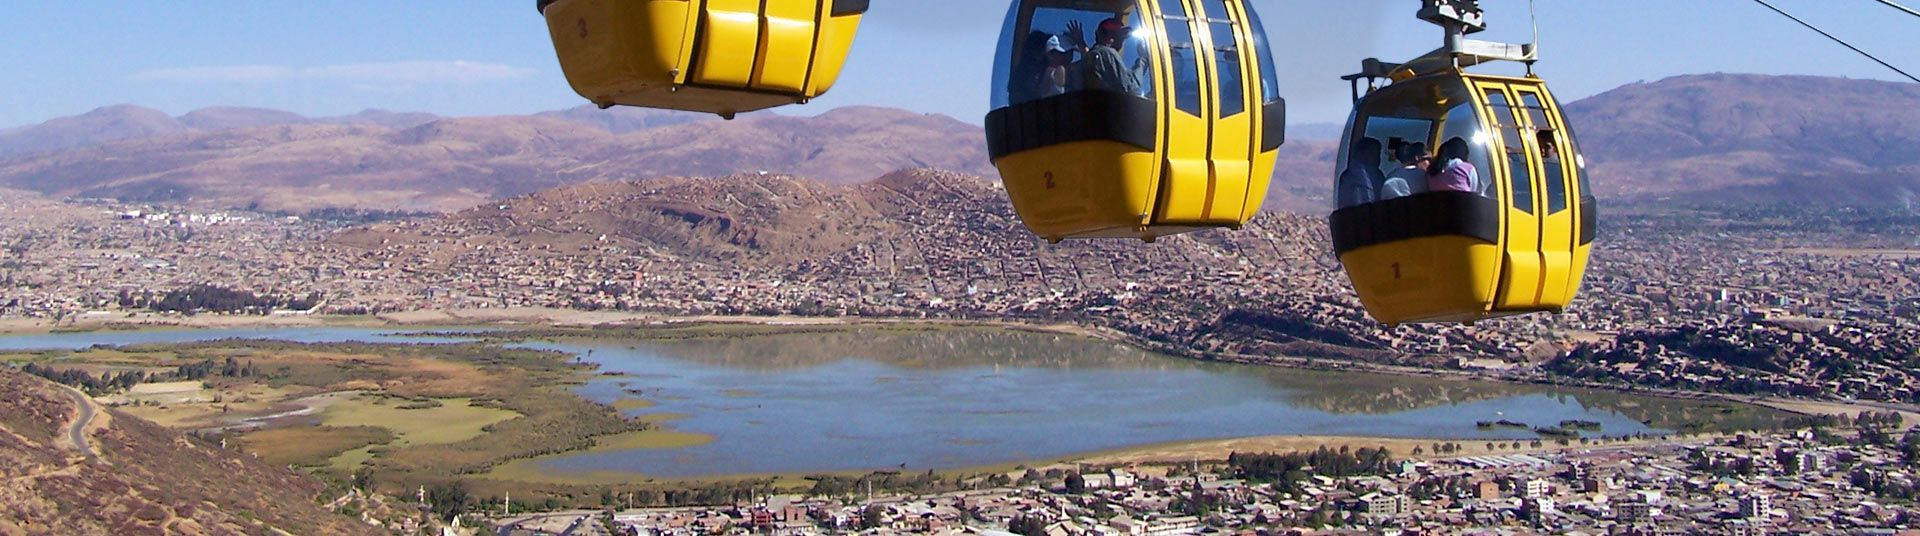 vol cochabamba cbb billet d 39 avion cochabamba pas cher avec. Black Bedroom Furniture Sets. Home Design Ideas